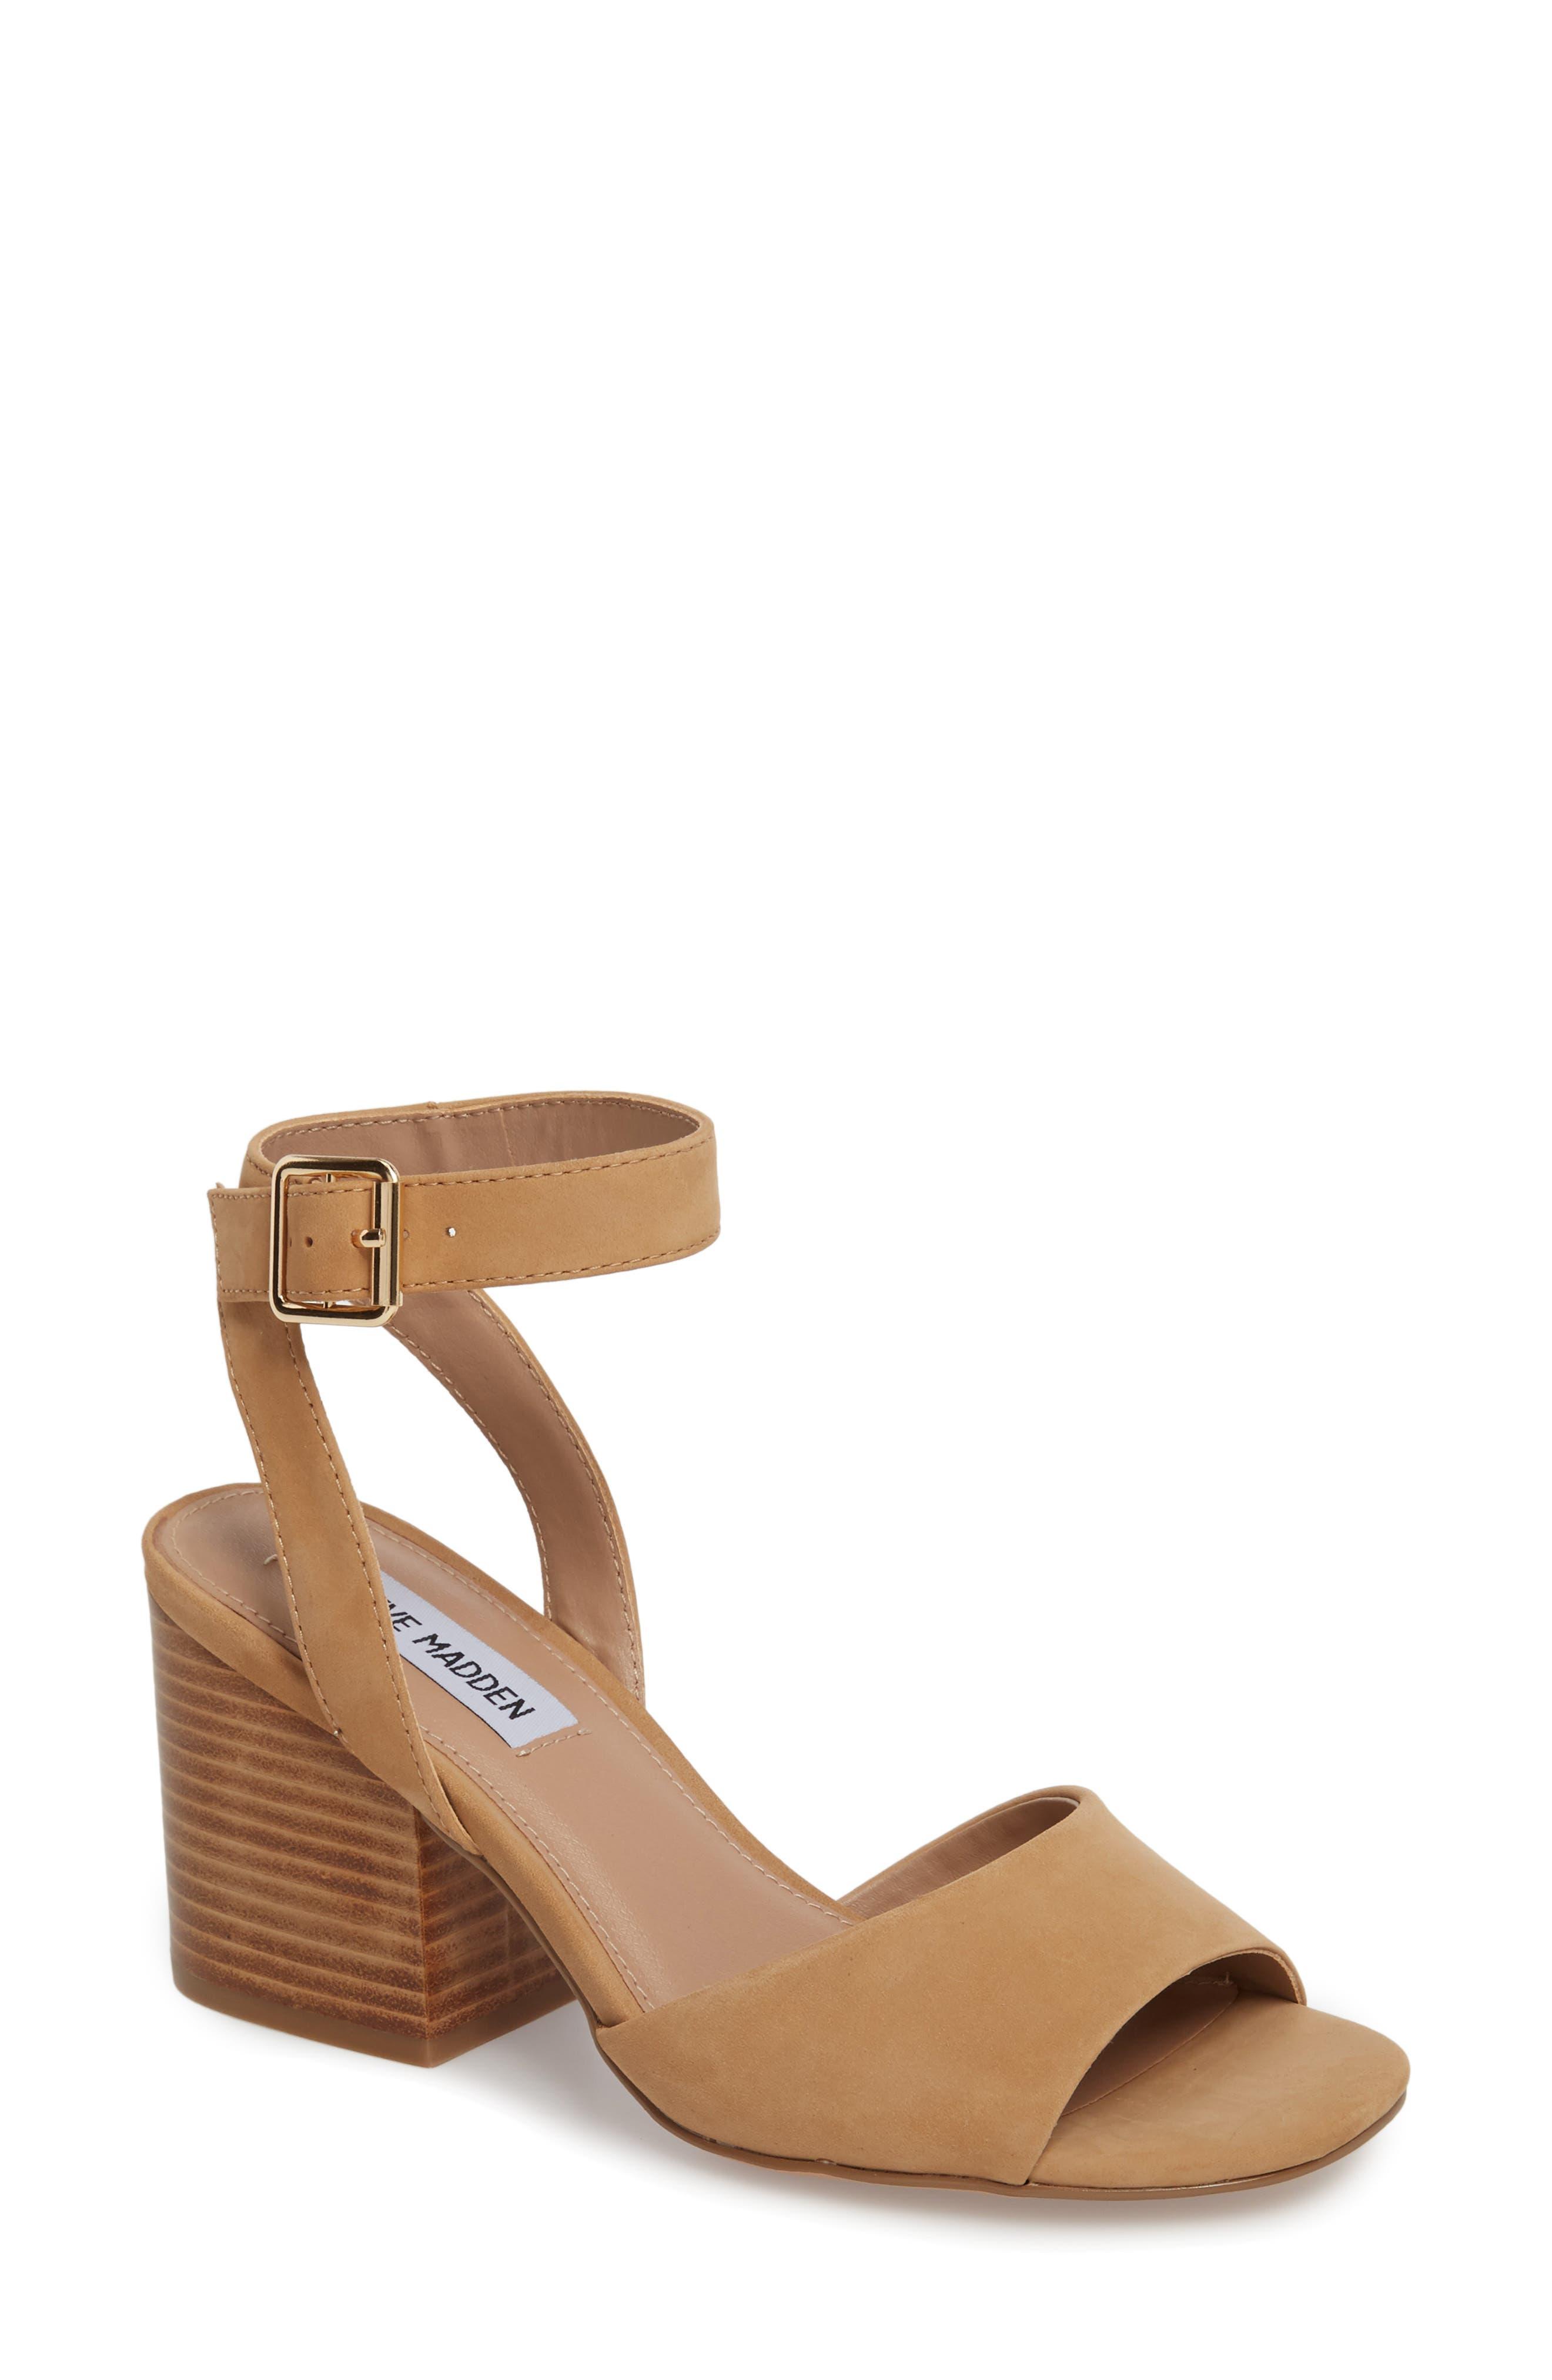 Devlin Block Heel Sandal,                             Main thumbnail 1, color,                             200